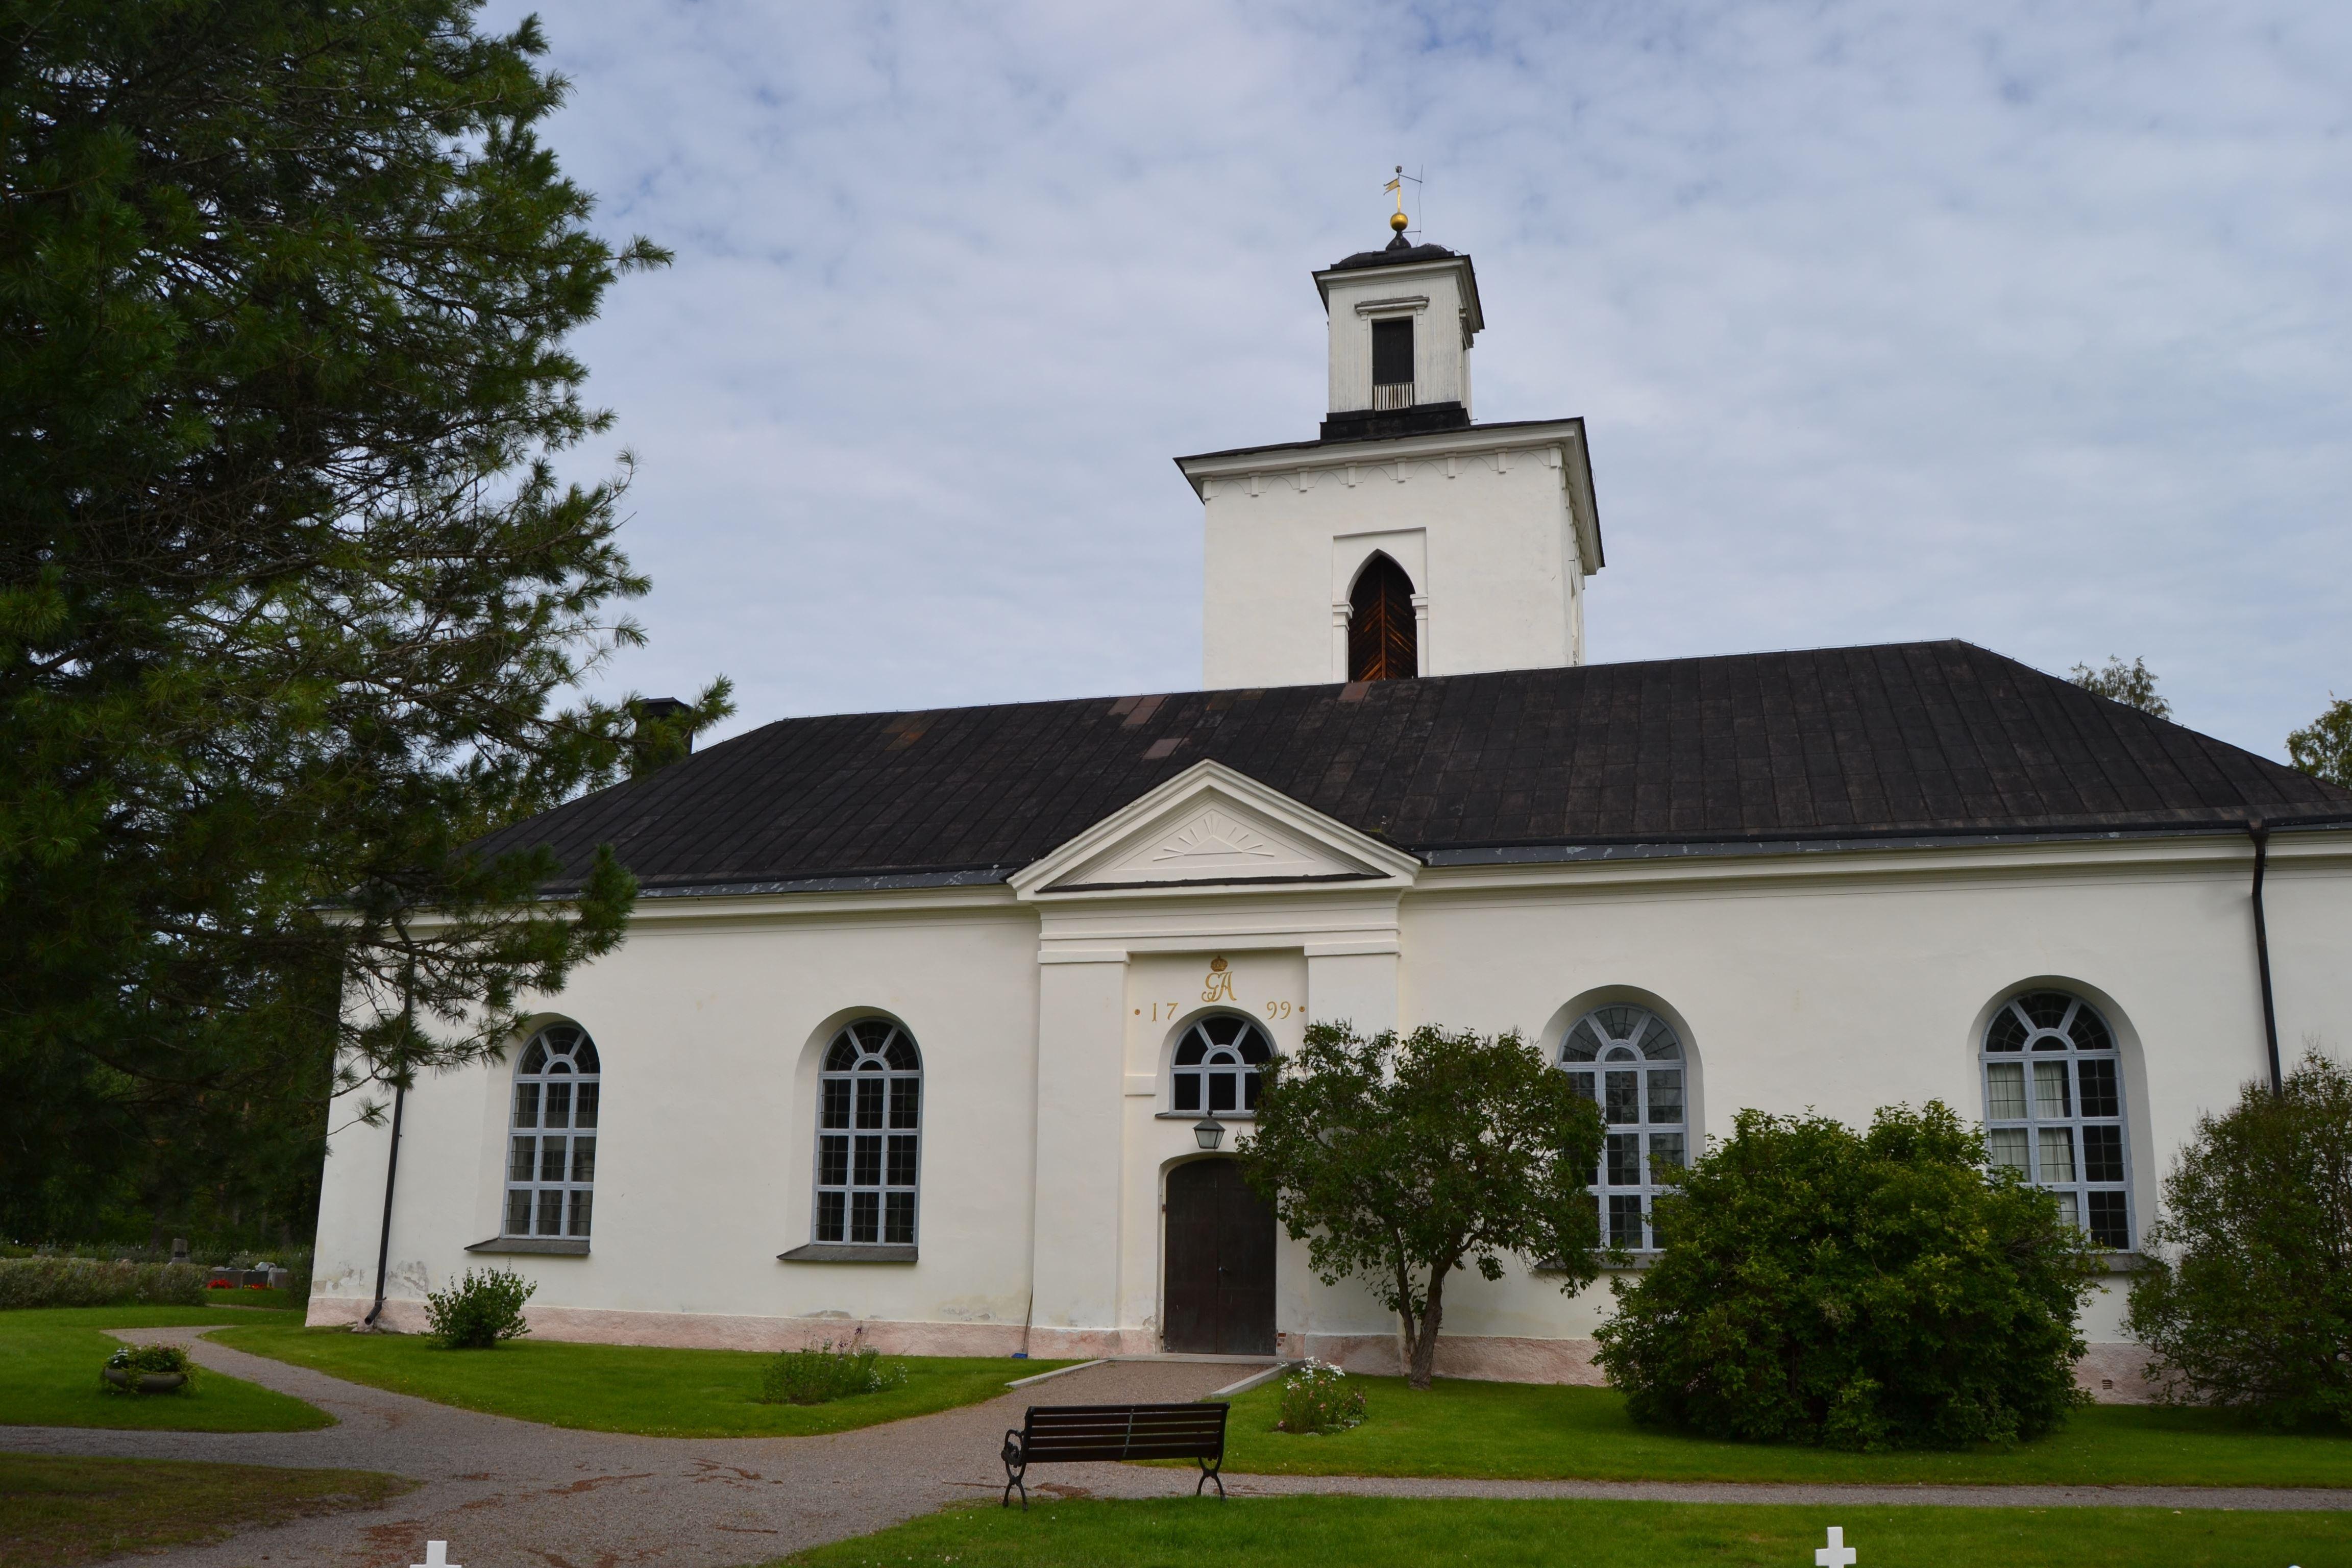 Norrbo church